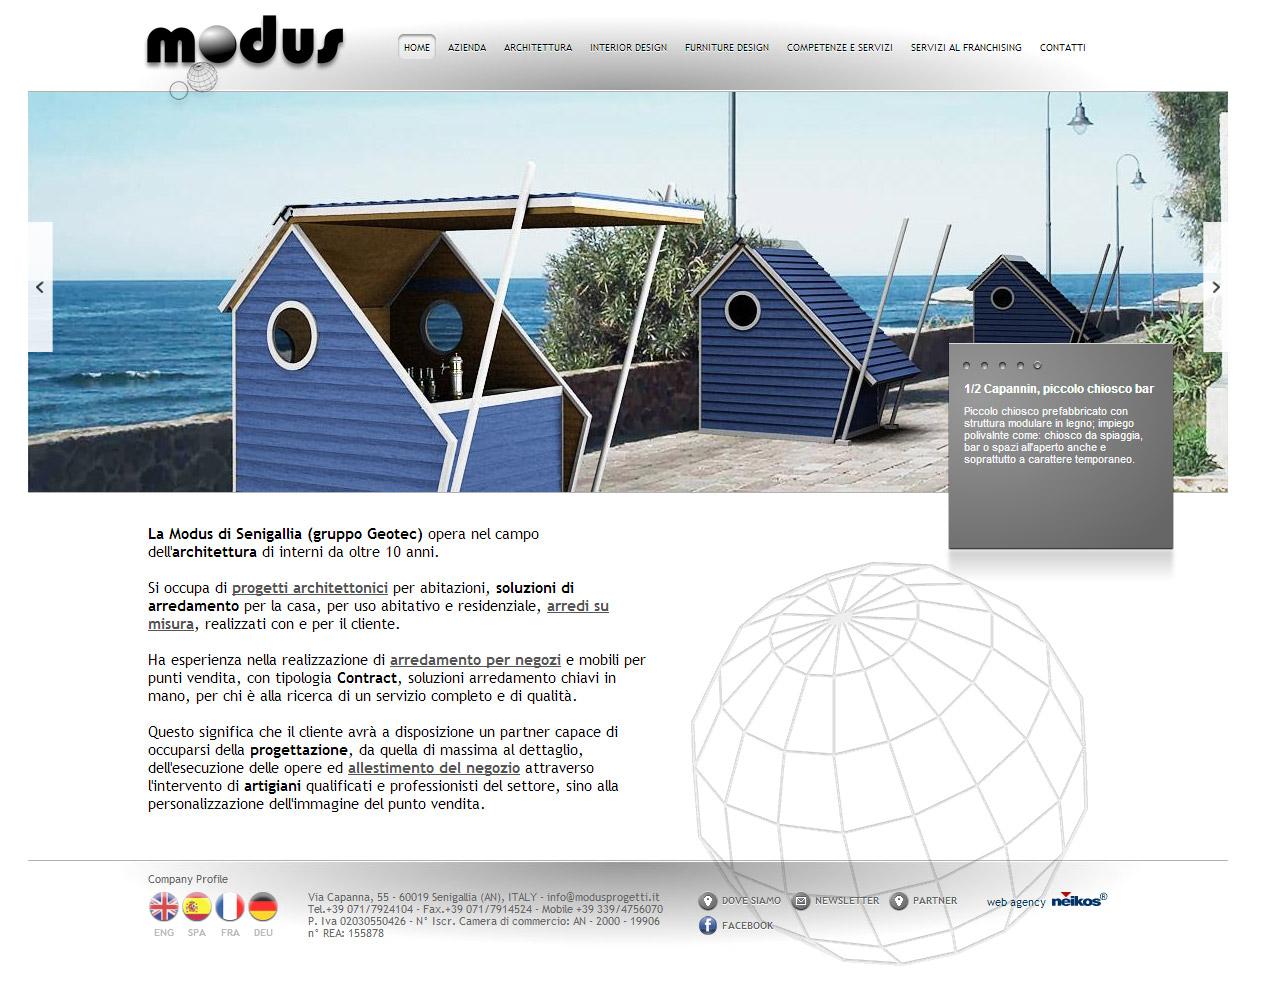 Modus, progetti architettonici